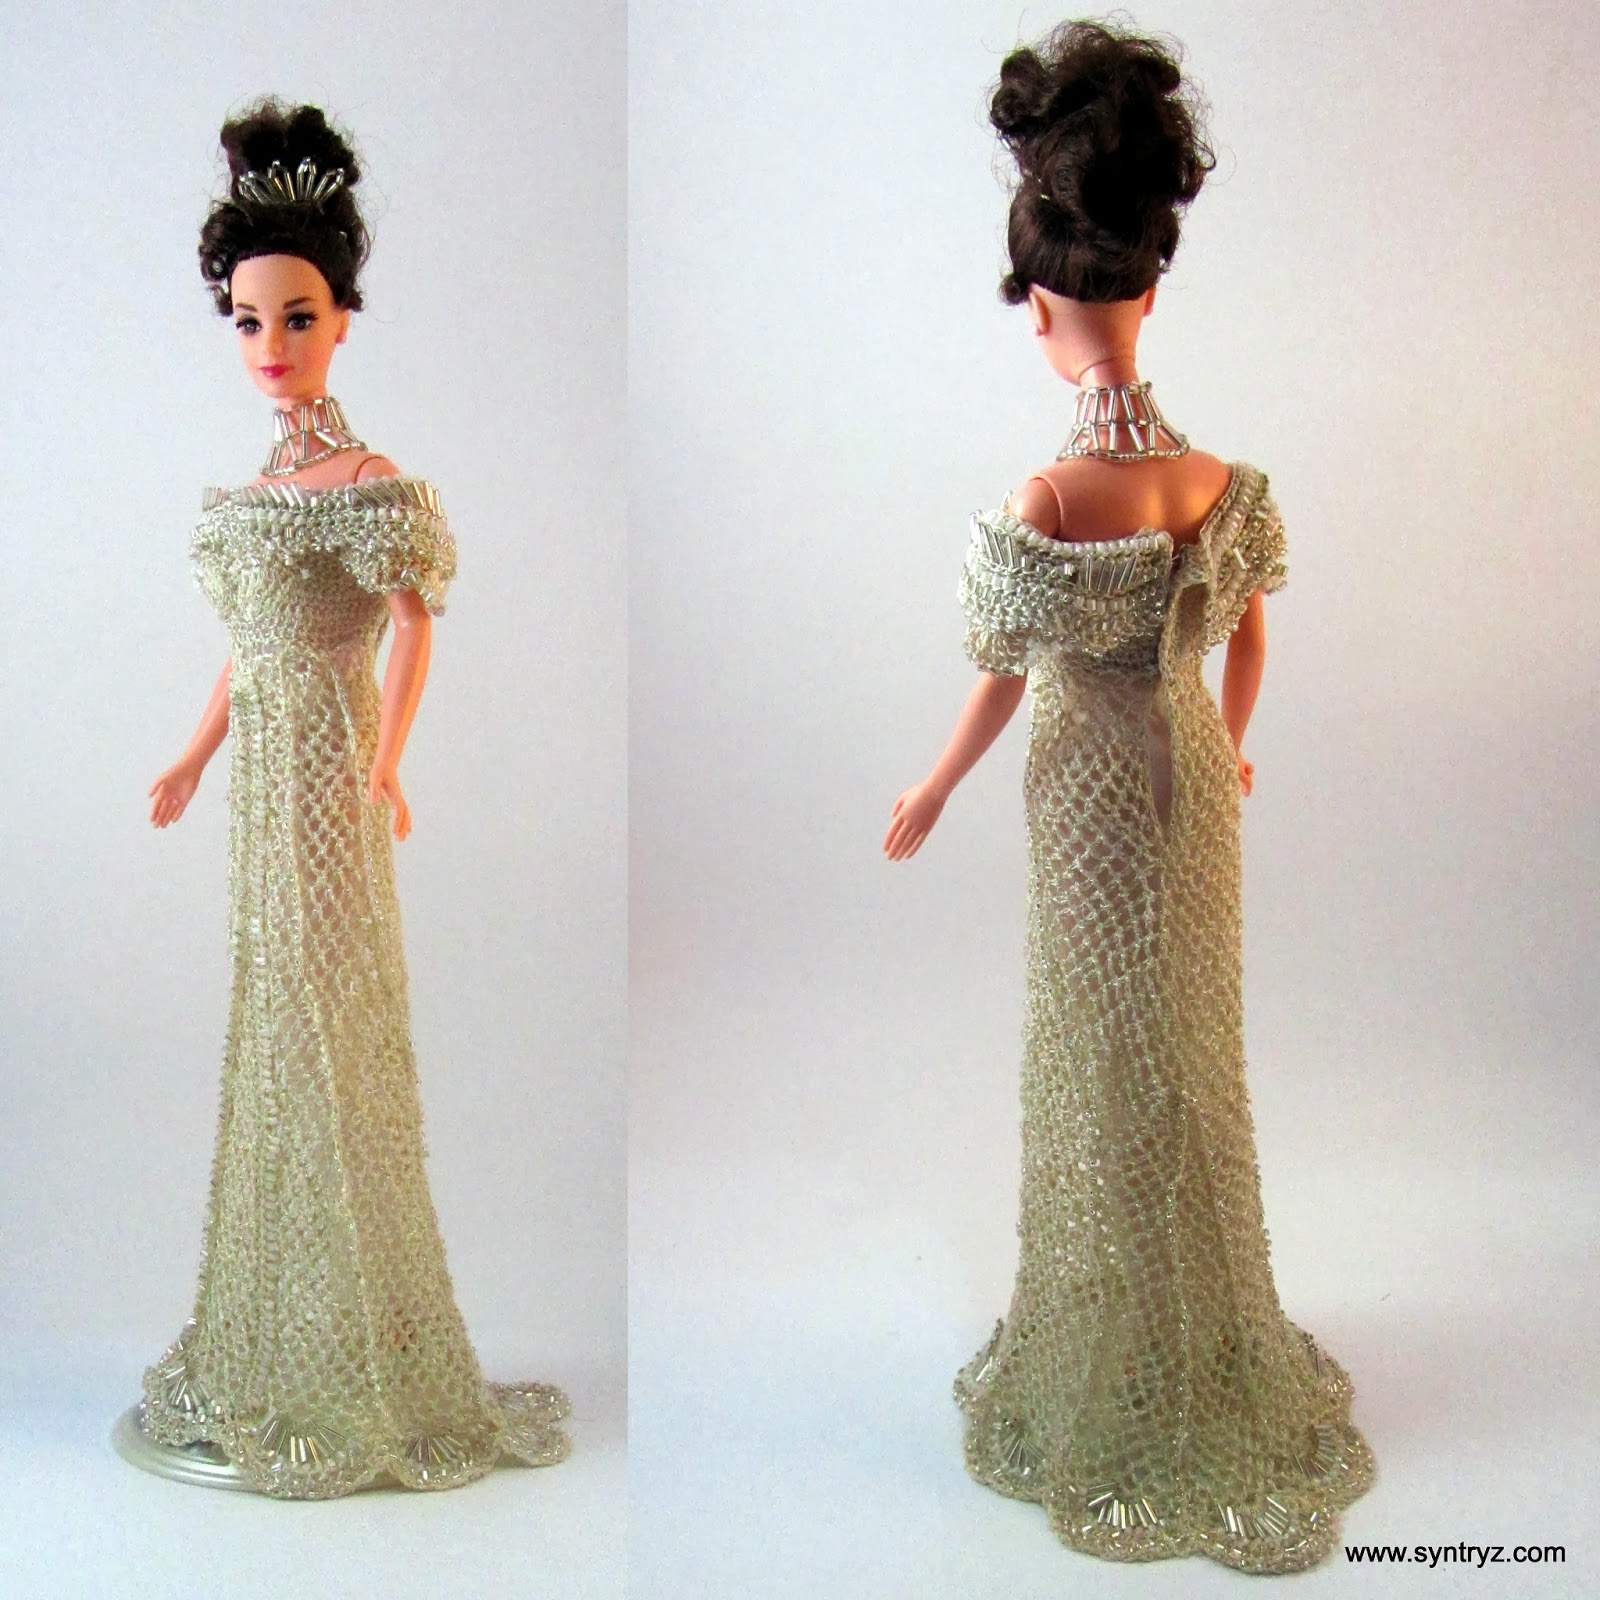 SYNTRYZ Stitches: Embassy Ball Gown Doll 2013